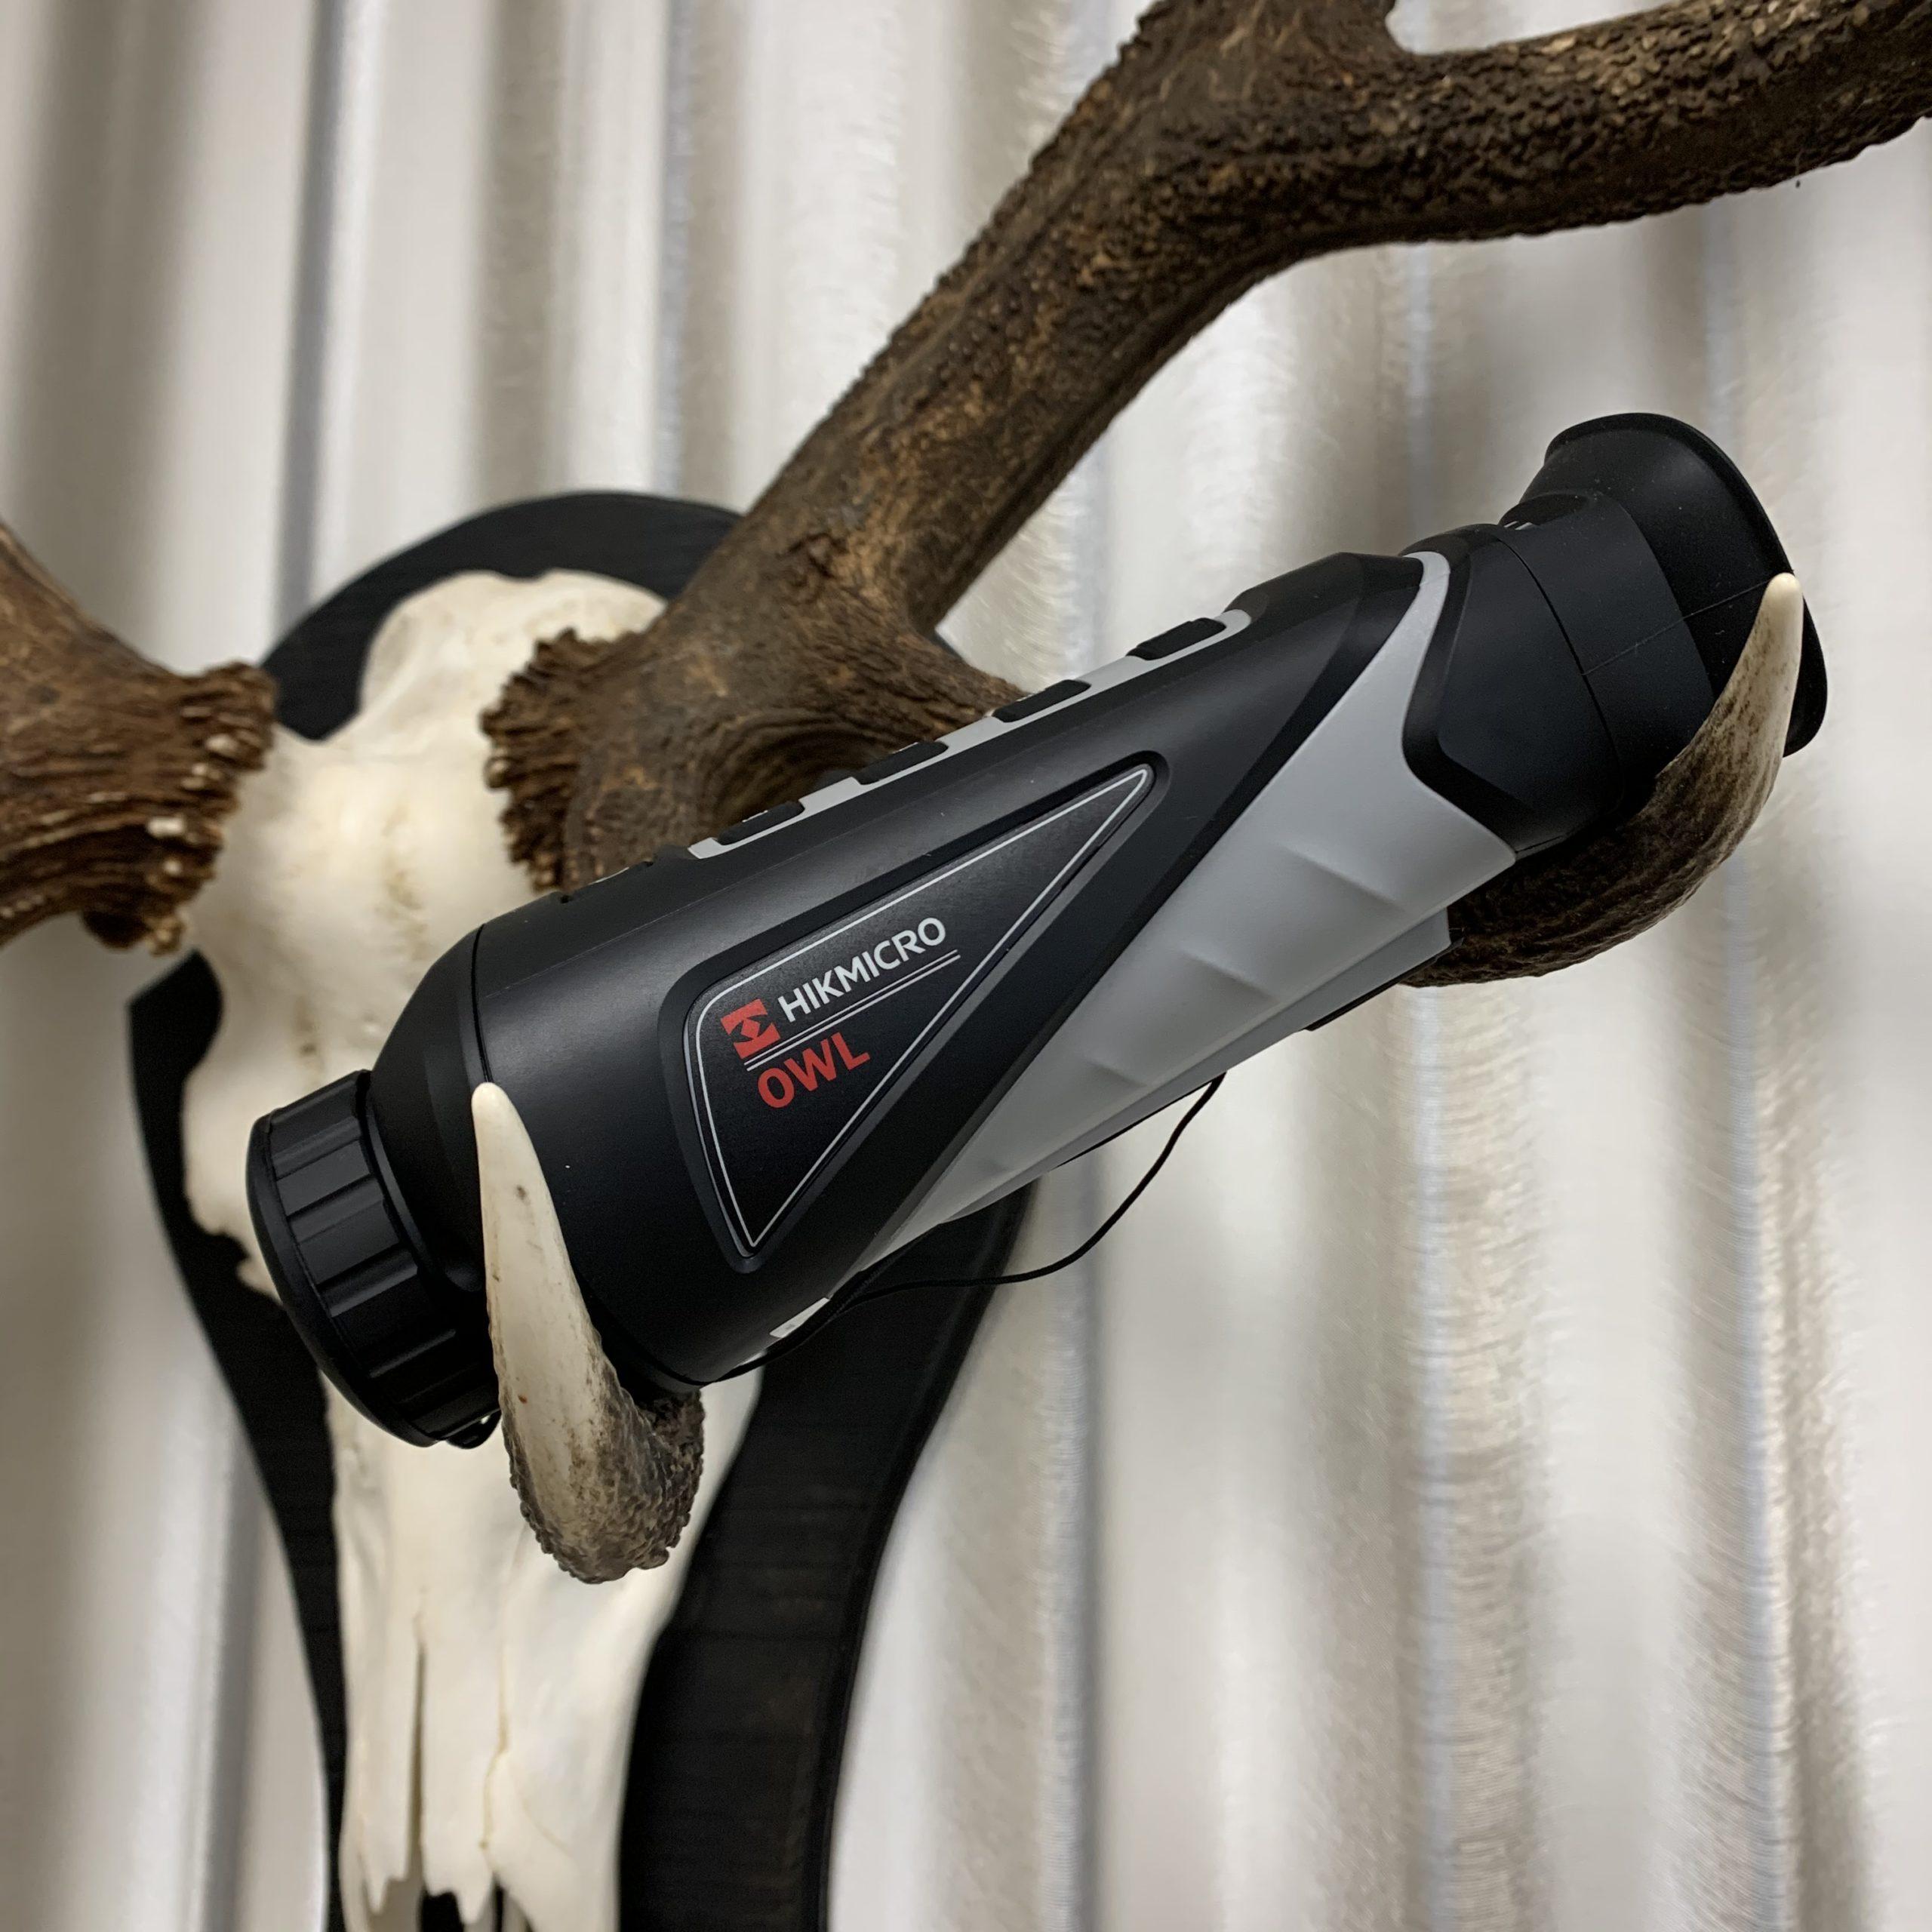 HIK VISION Wärmebildkamera HIK MICRO OWL OH 35 BRANDNEUES MODELL